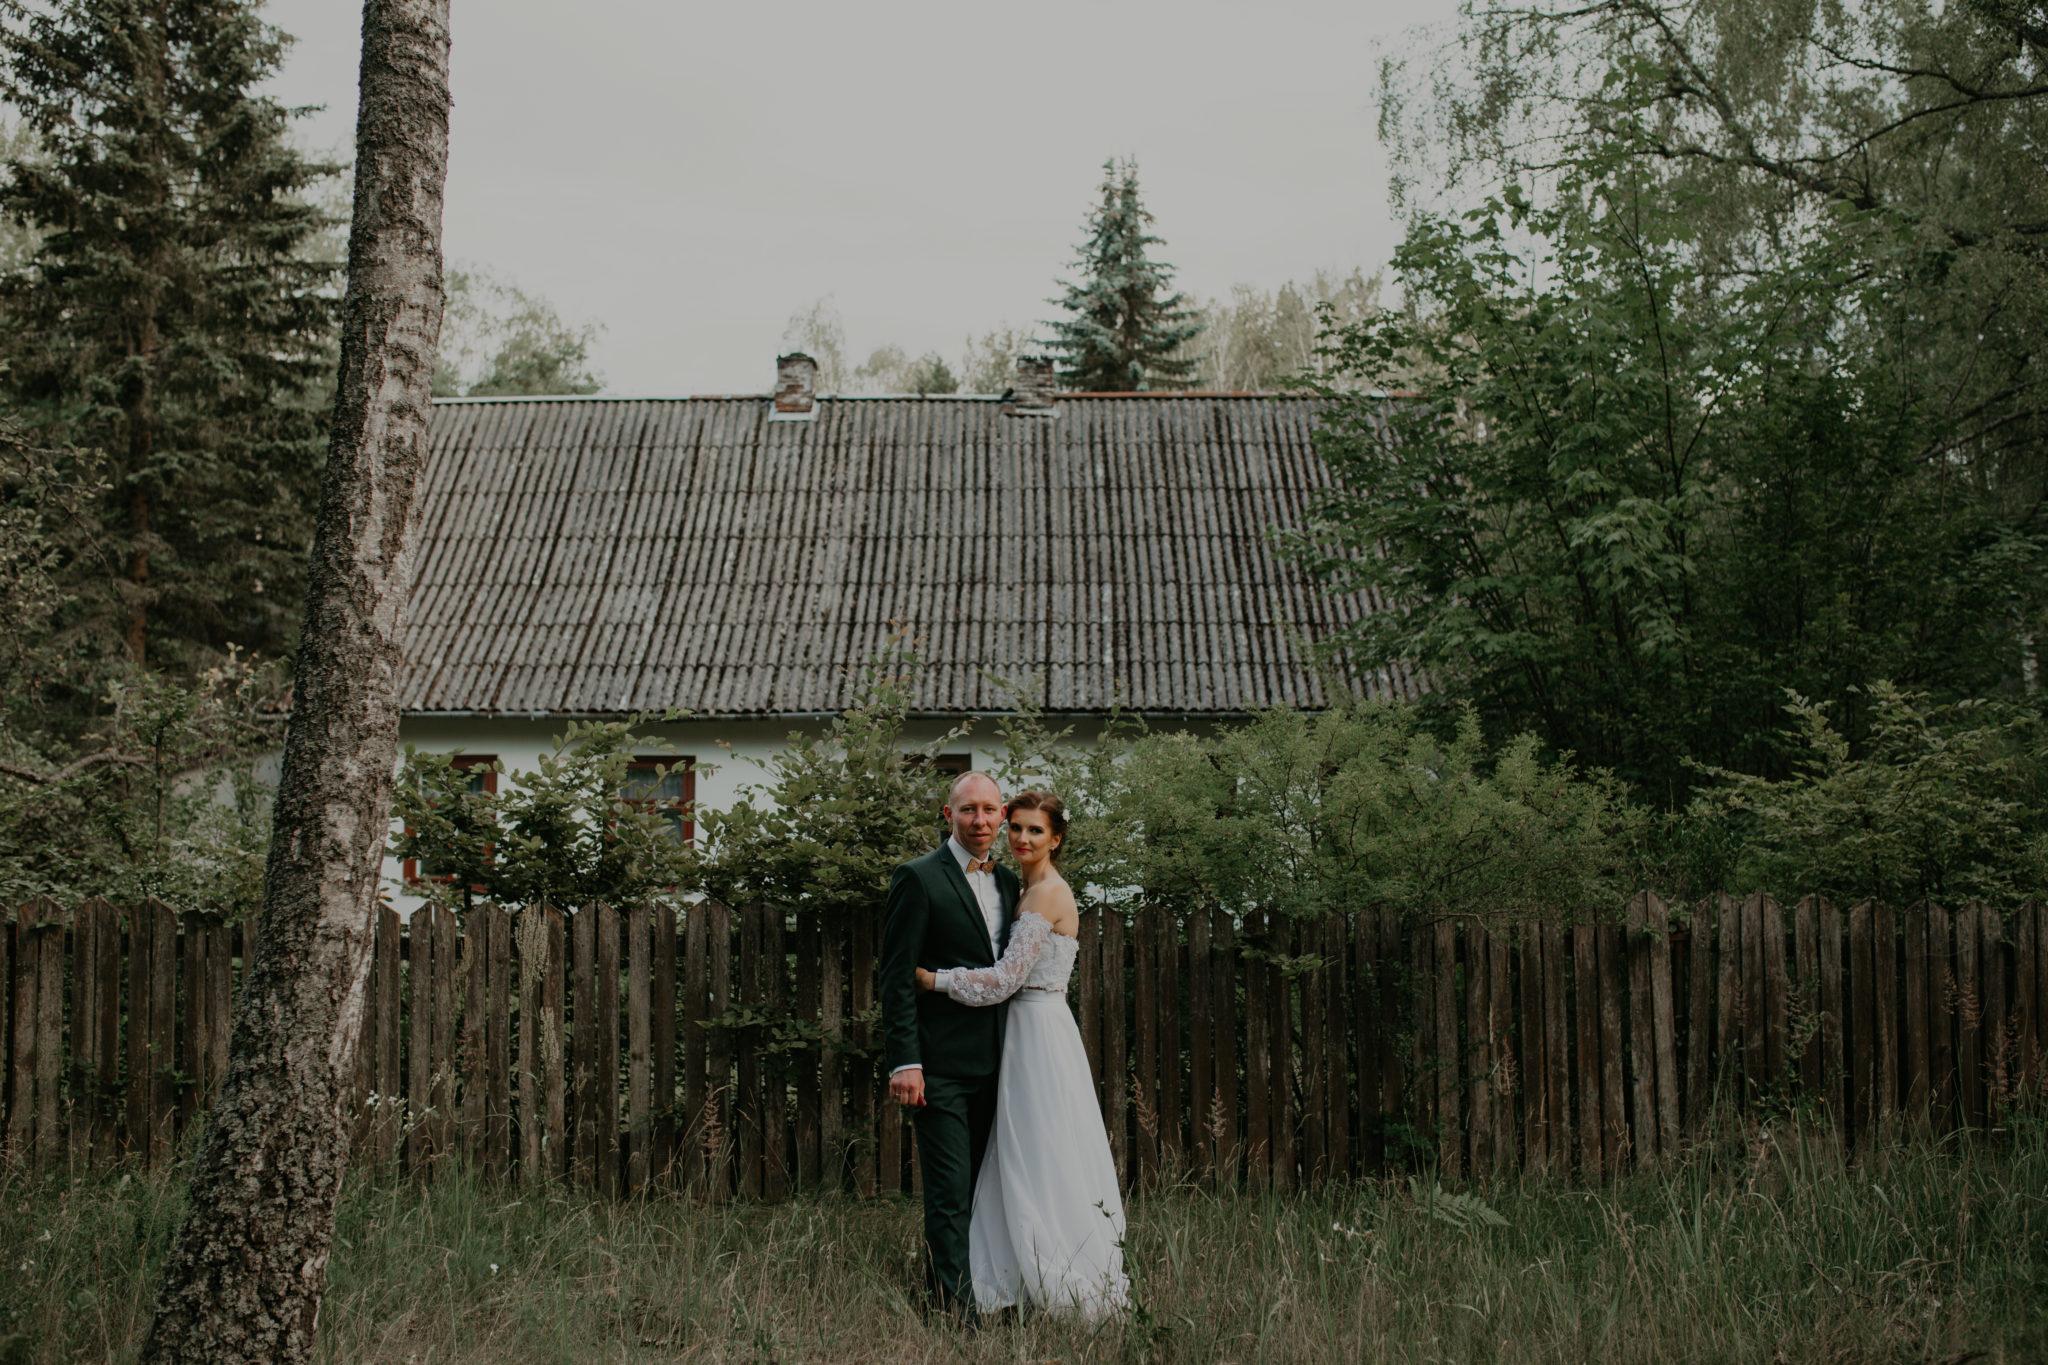 gosia i kubaplener 16 1 - fotografiagk Fotografia ślubna RK wedding